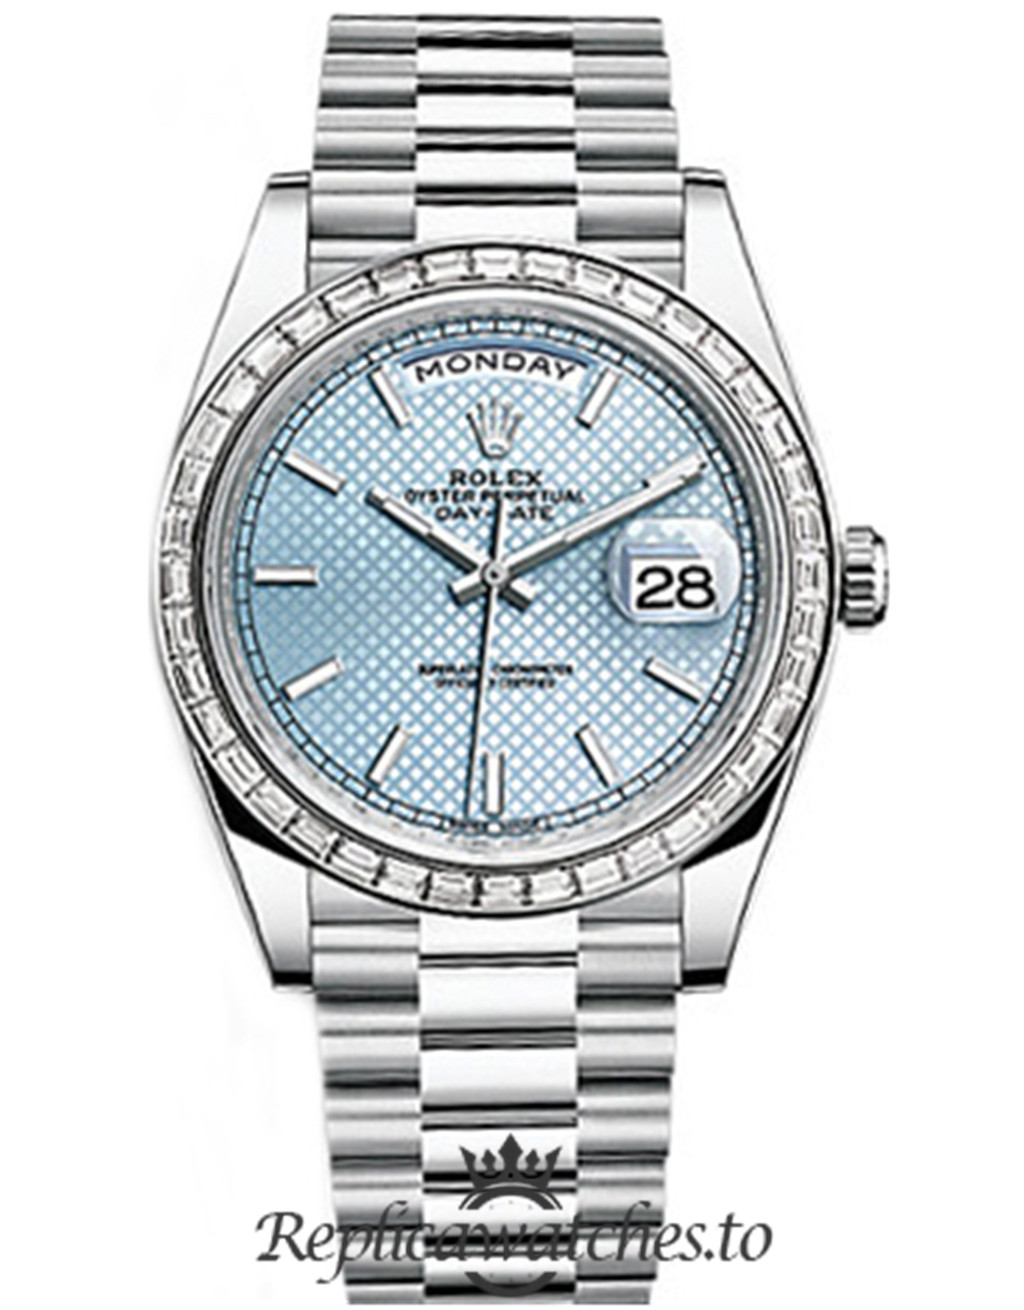 Rolex Day Date Replica 228396TBR 002 Silver Strap 40MM